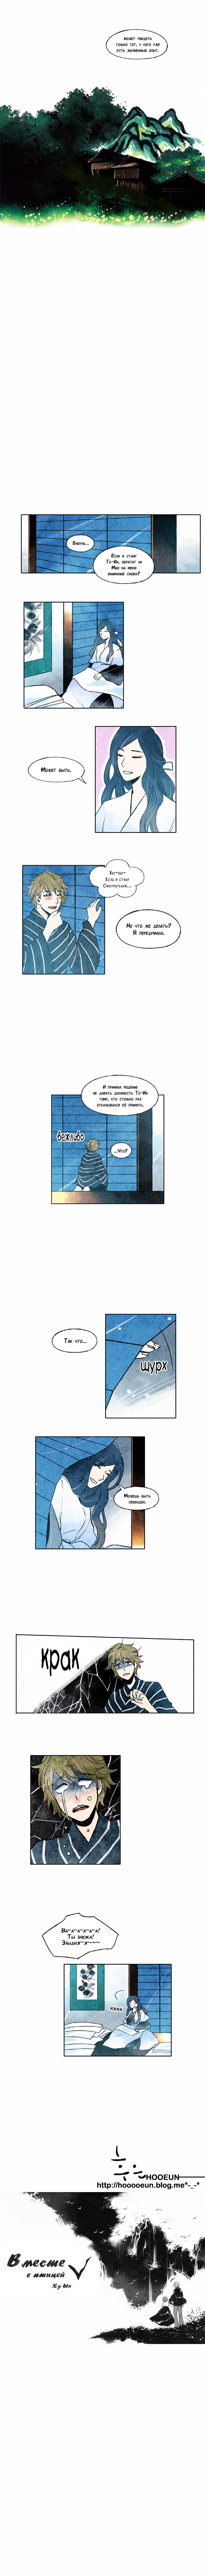 https://r1.ninemanga.com/comics/pic2/39/22503/416383/1532884389176.jpg Page 5